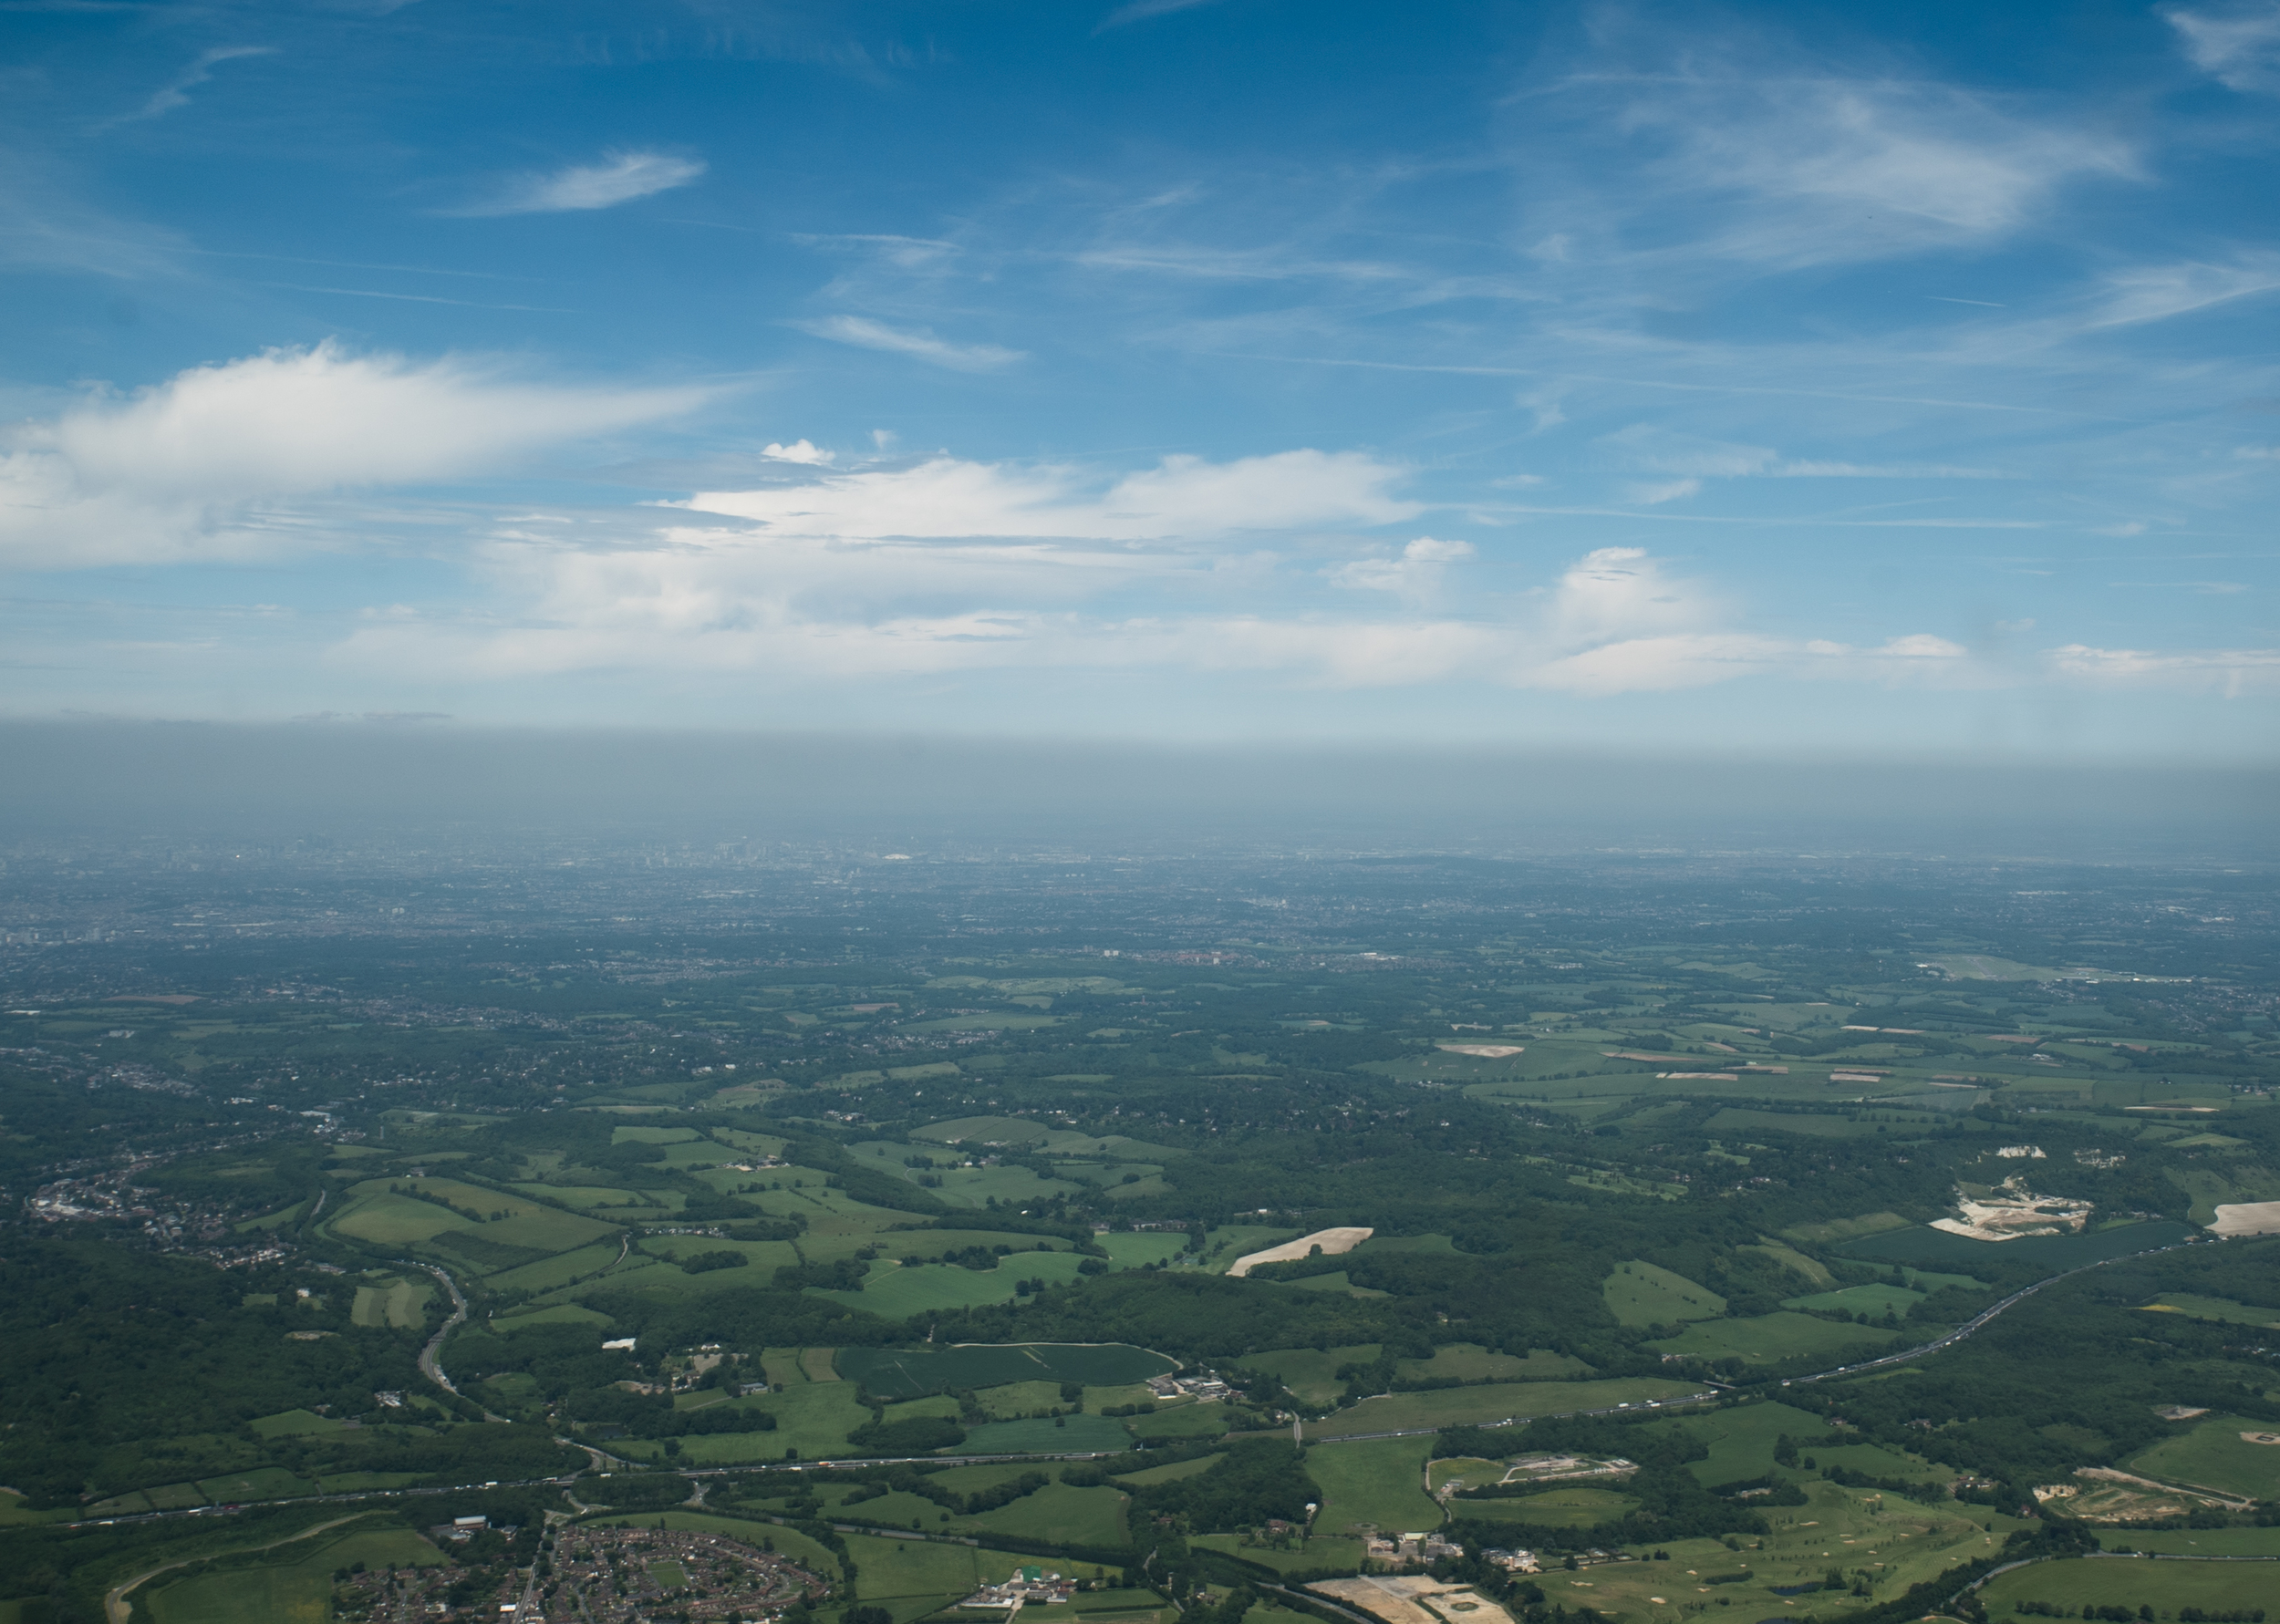 aerial photo over England